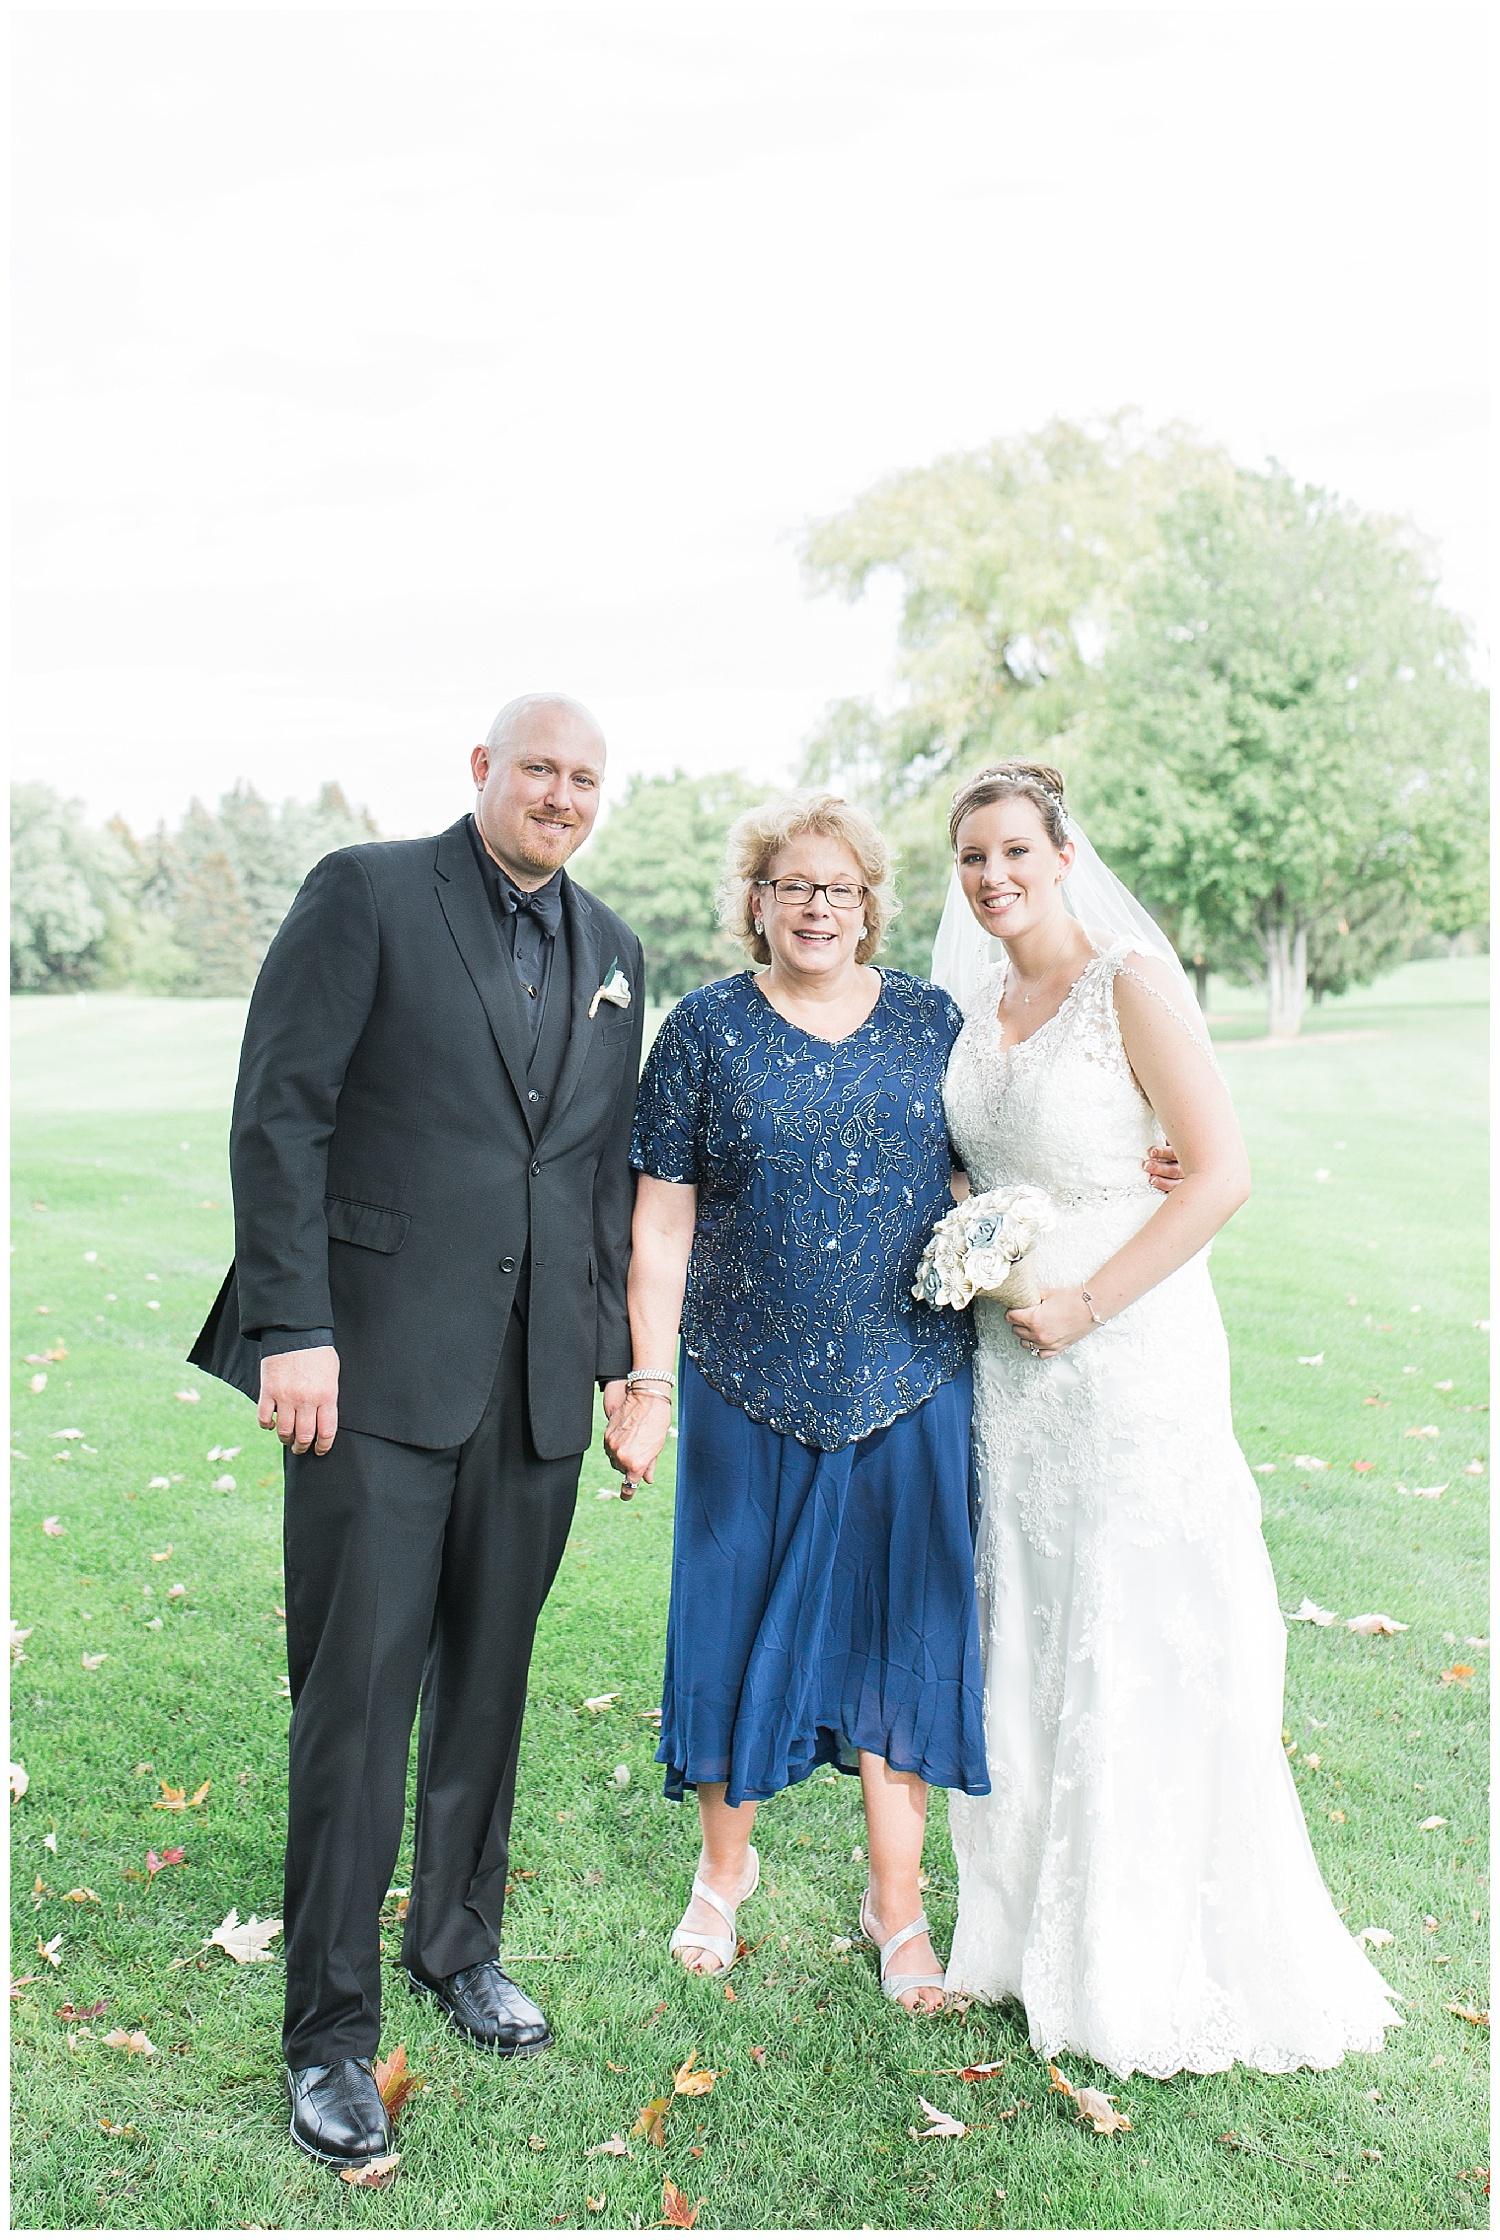 Jessica and Scott McKay - Terry Hills Golf Course - Batavia NY - Lass and Beau-112_Buffalo wedding photography.jpg